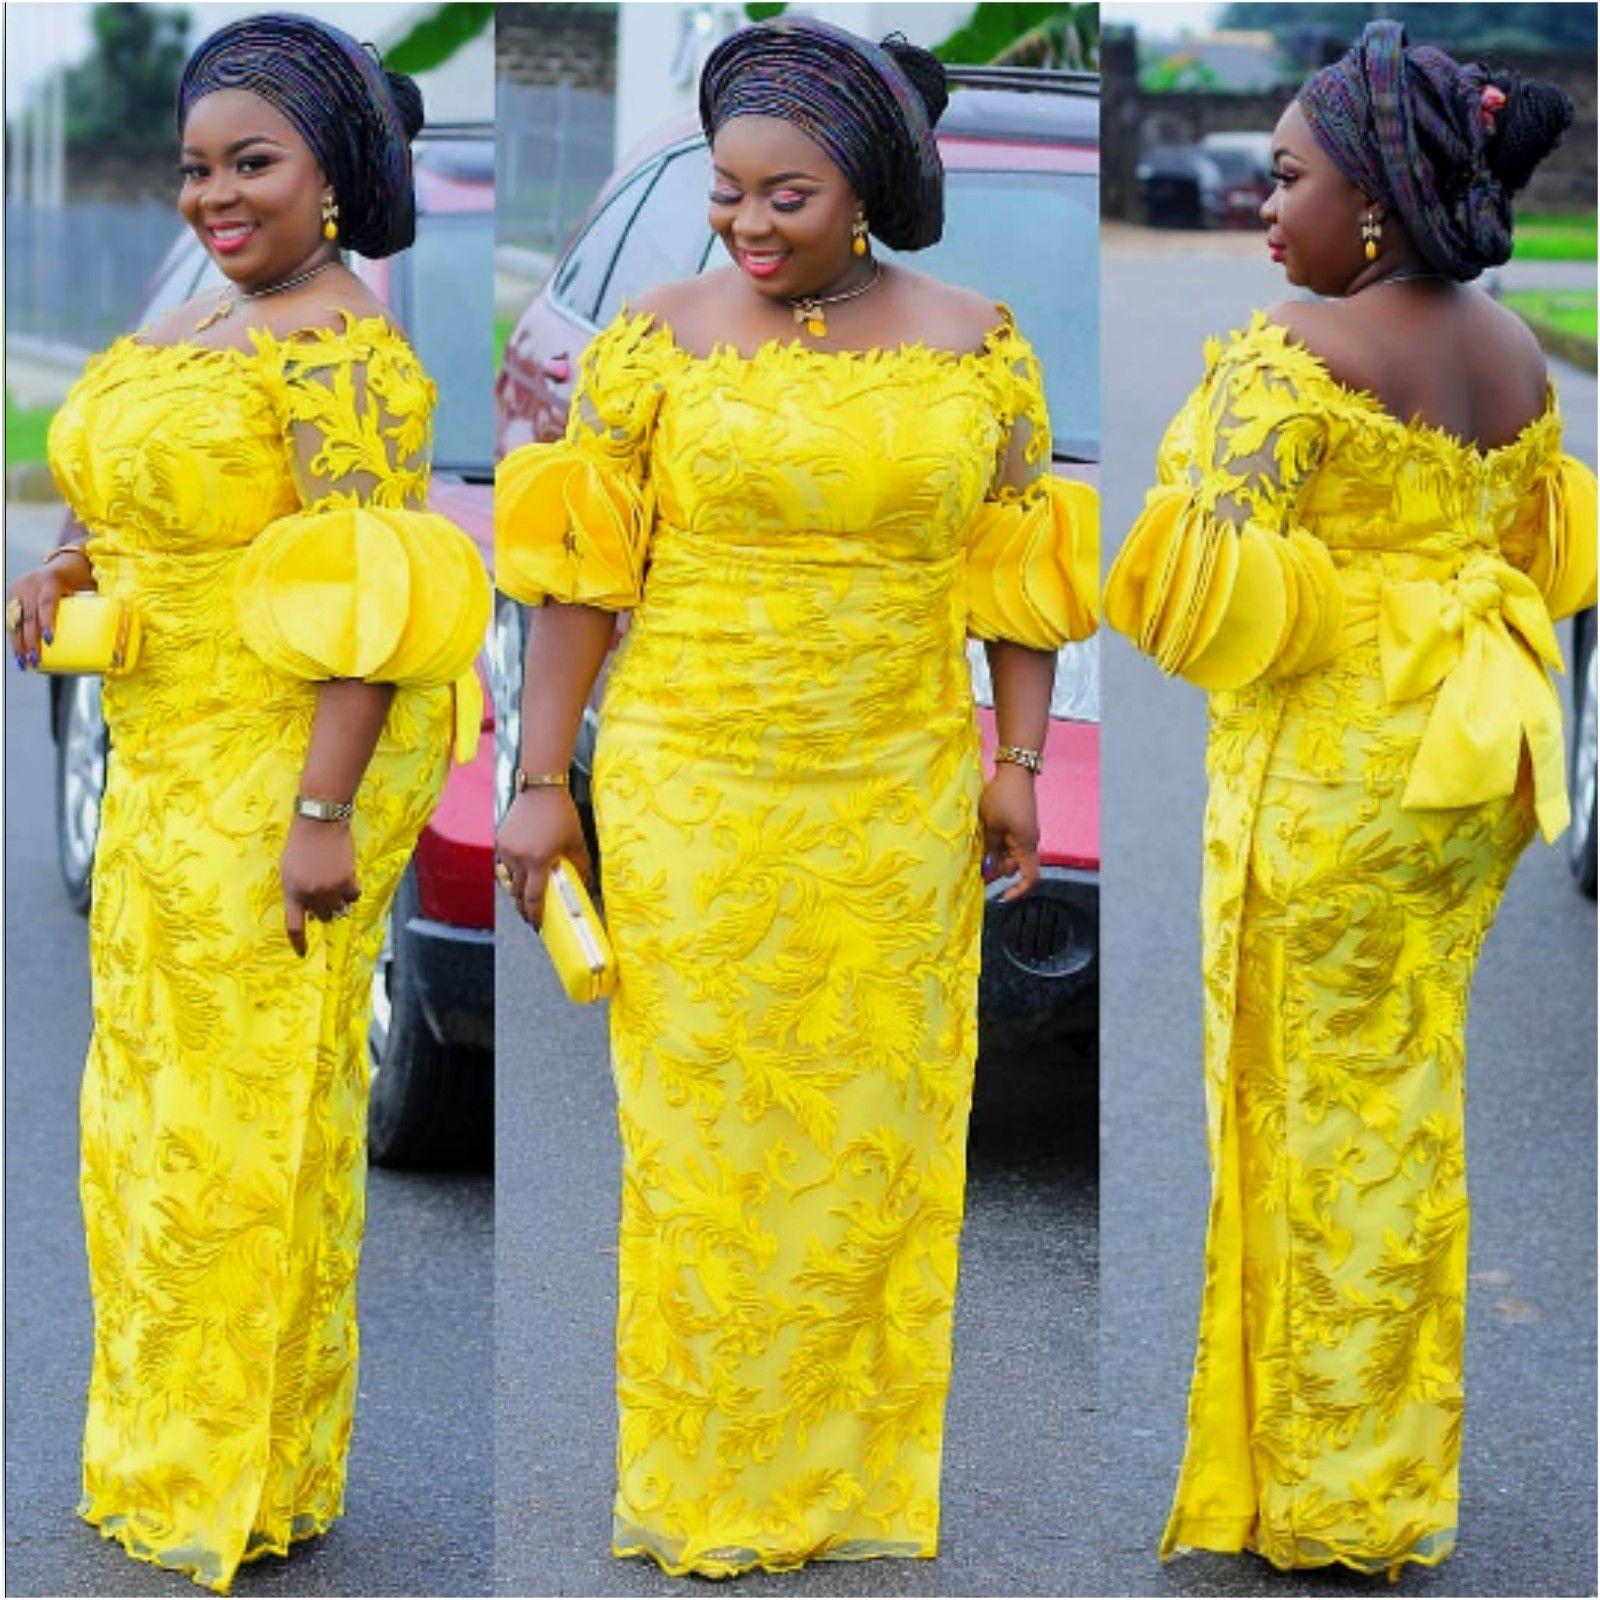 Lace Asoebi Styles Asoebi Special Latest African Fashion Aso Ebi Fashion Afri Nigerian Lace Dress Latest African Fashion Dresses African Print Fashion Dresses